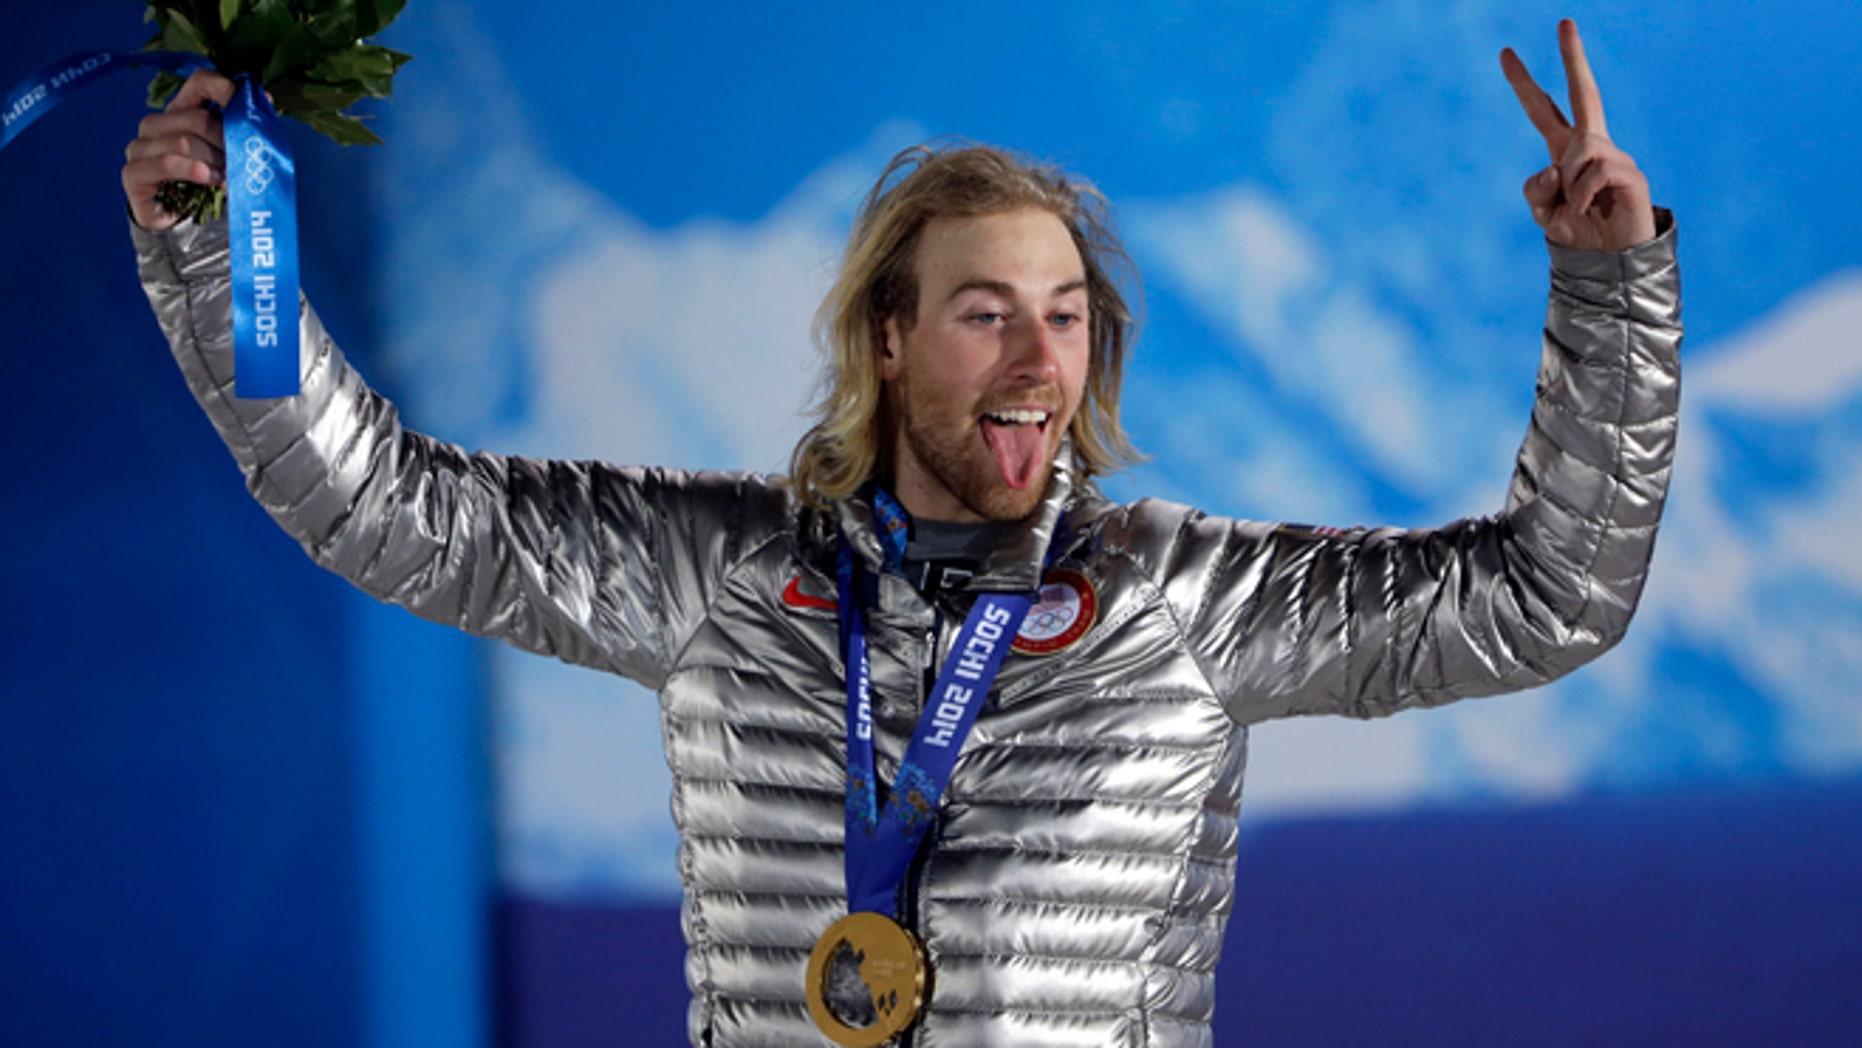 Feb. 8, 2014: U.S. Olympic gold medal winner Sage Kotsenburg in Sochi, Russia.